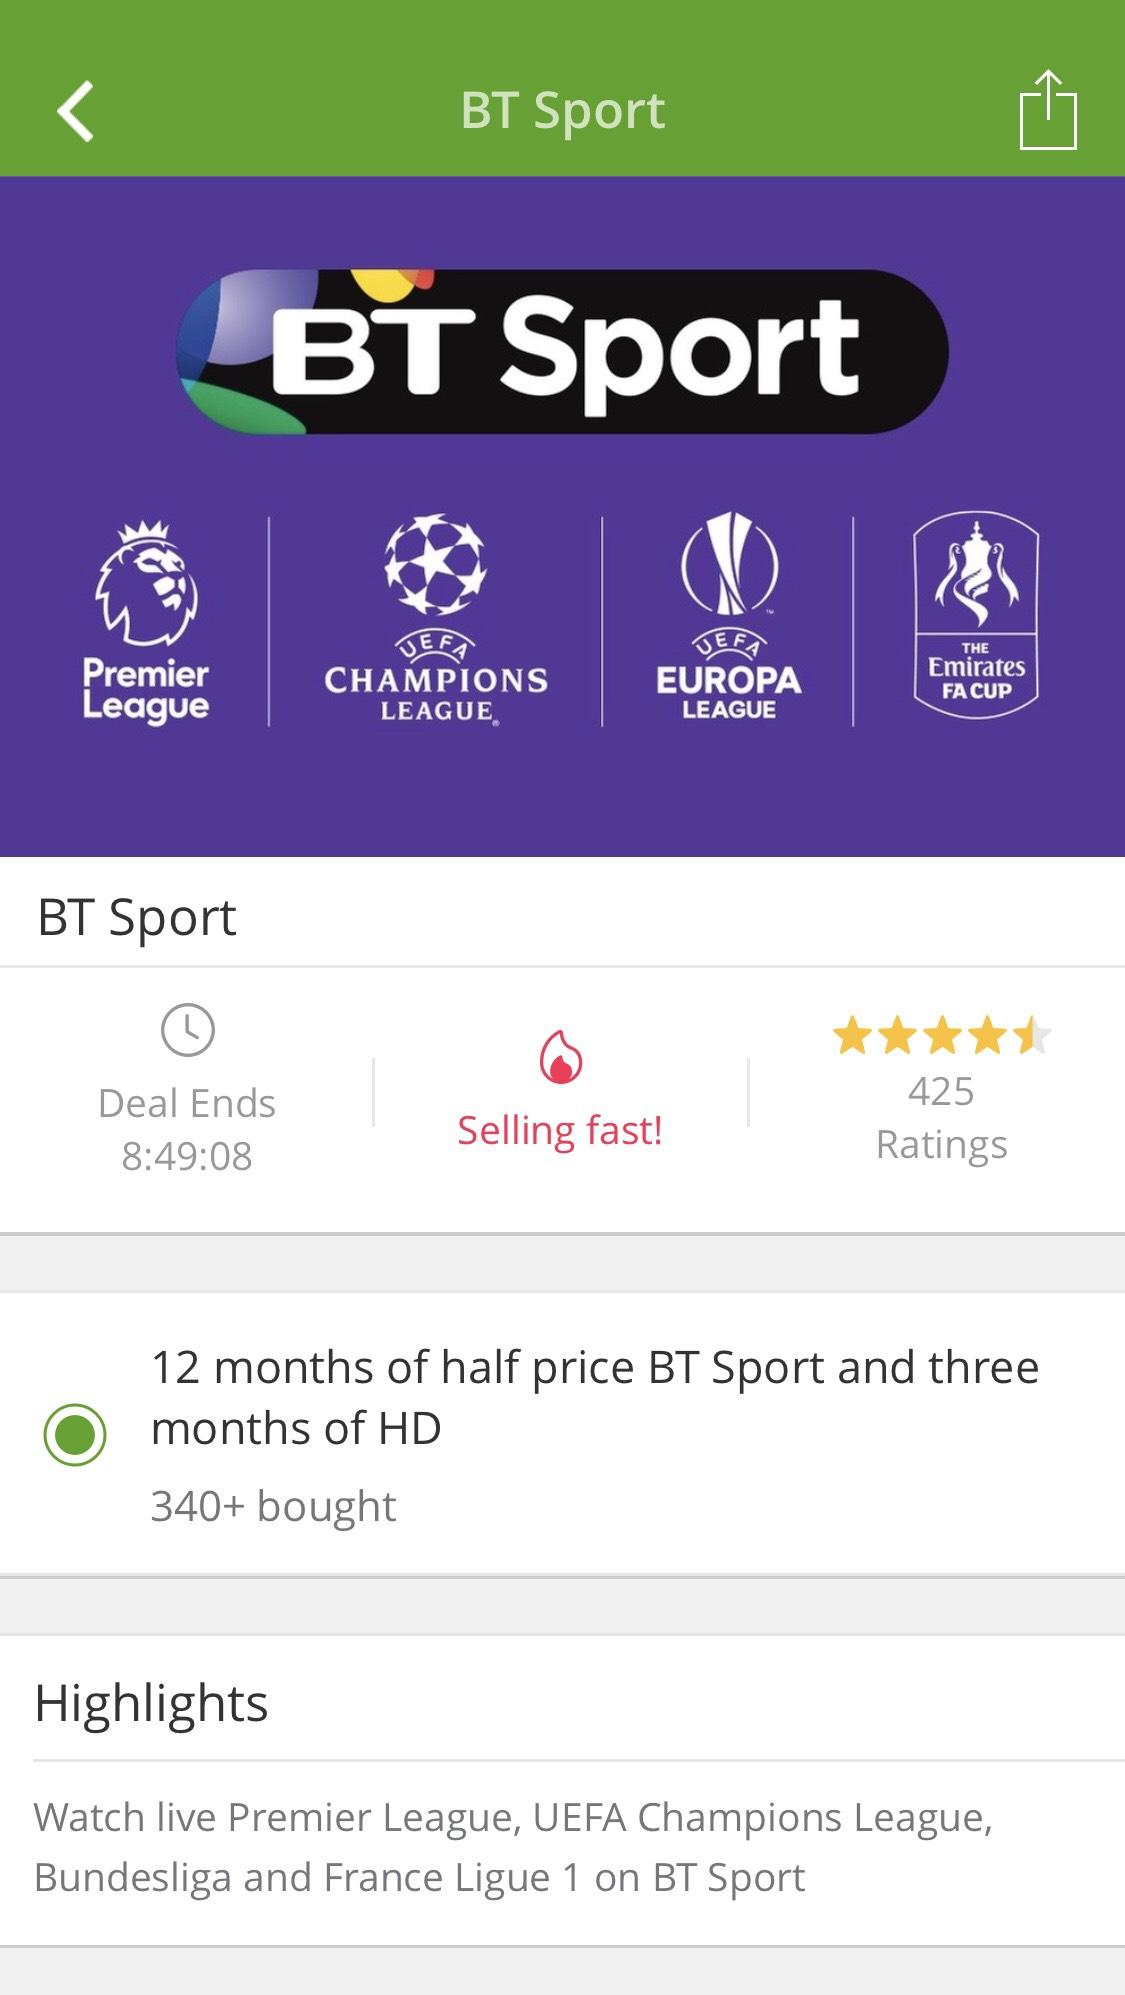 12 months half price BT Sport Groupon voucher - £12.99 per month for the first twelve months - £20 activation fee